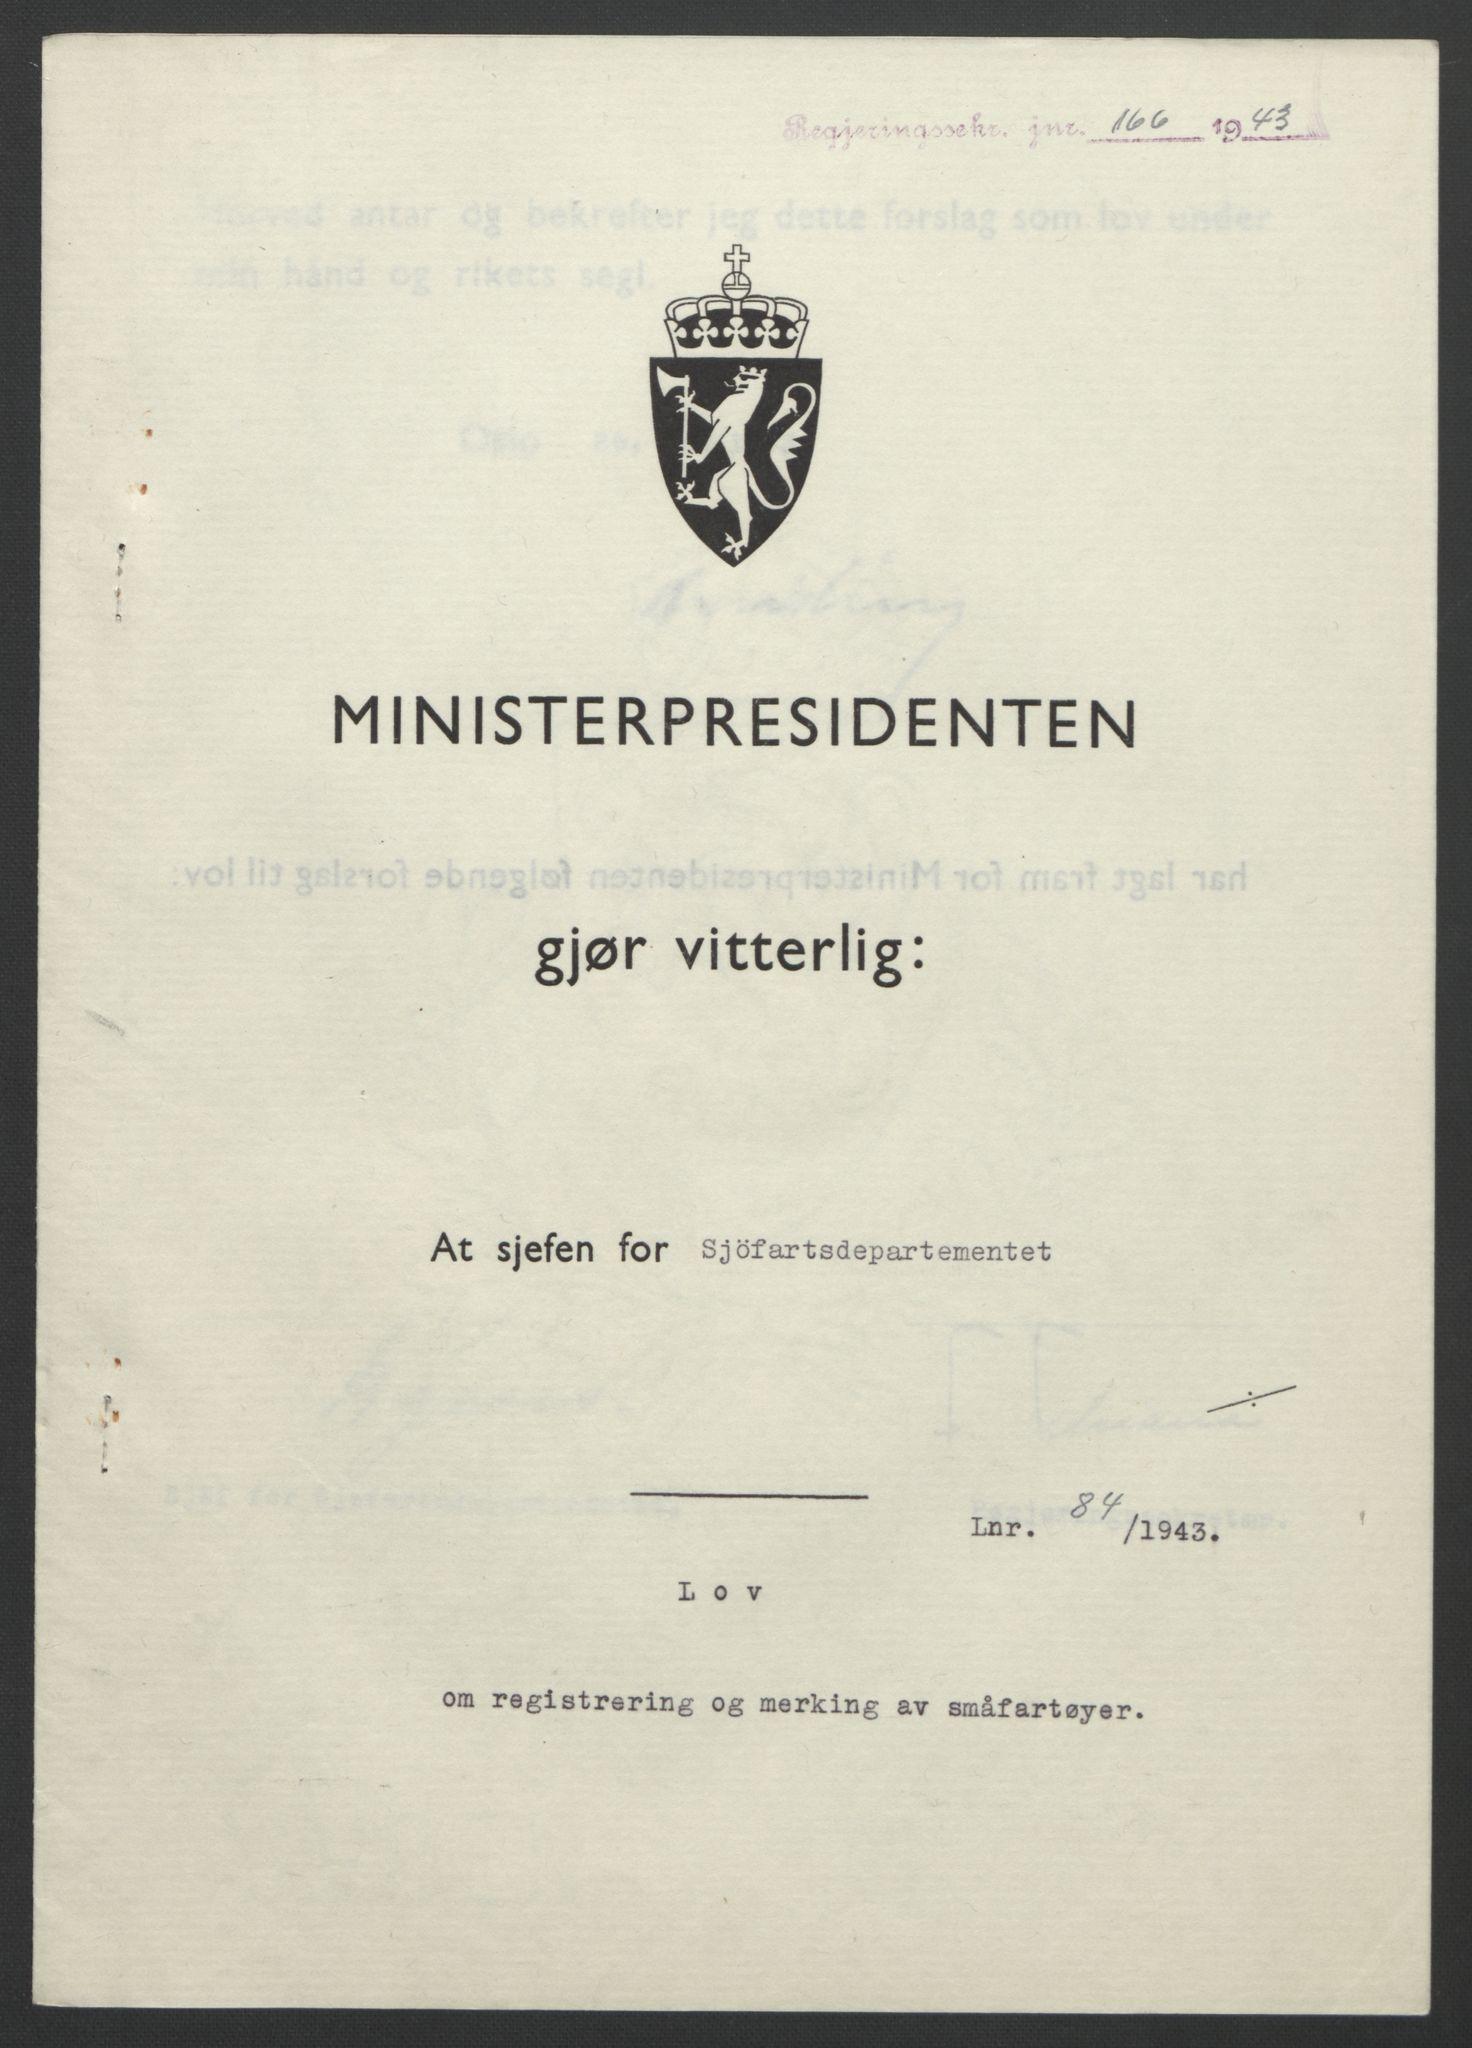 RA, NS-administrasjonen 1940-1945 (Statsrådsekretariatet, de kommisariske statsråder mm), D/Db/L0099: Lover, 1943, s. 383